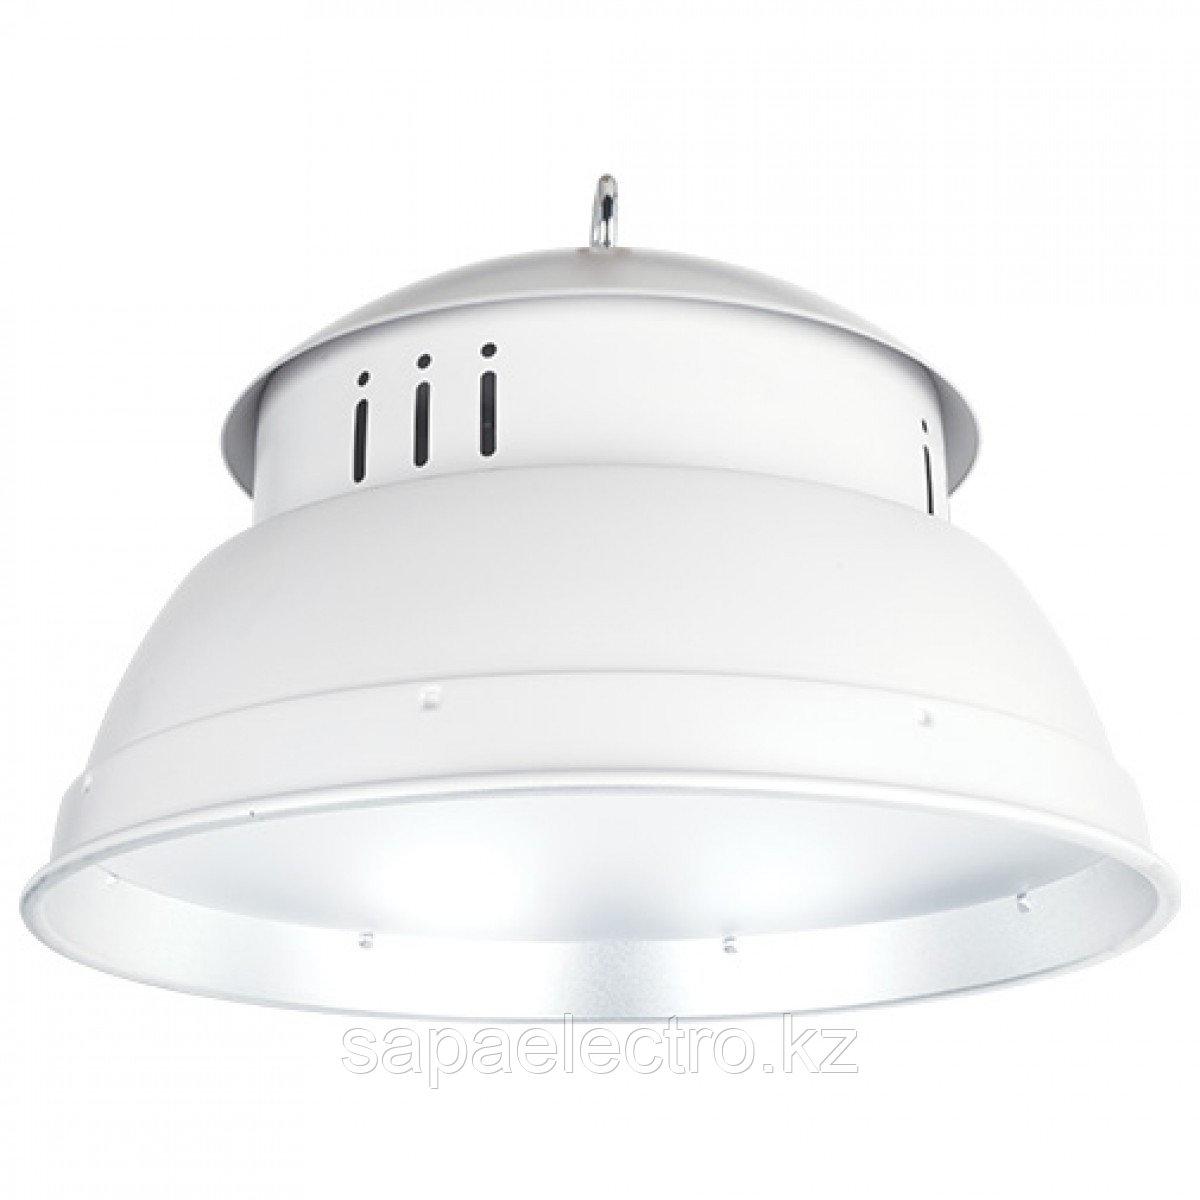 Свет-к LED TS-HB 150W 5500K SILVER (TEKSAN)1шт